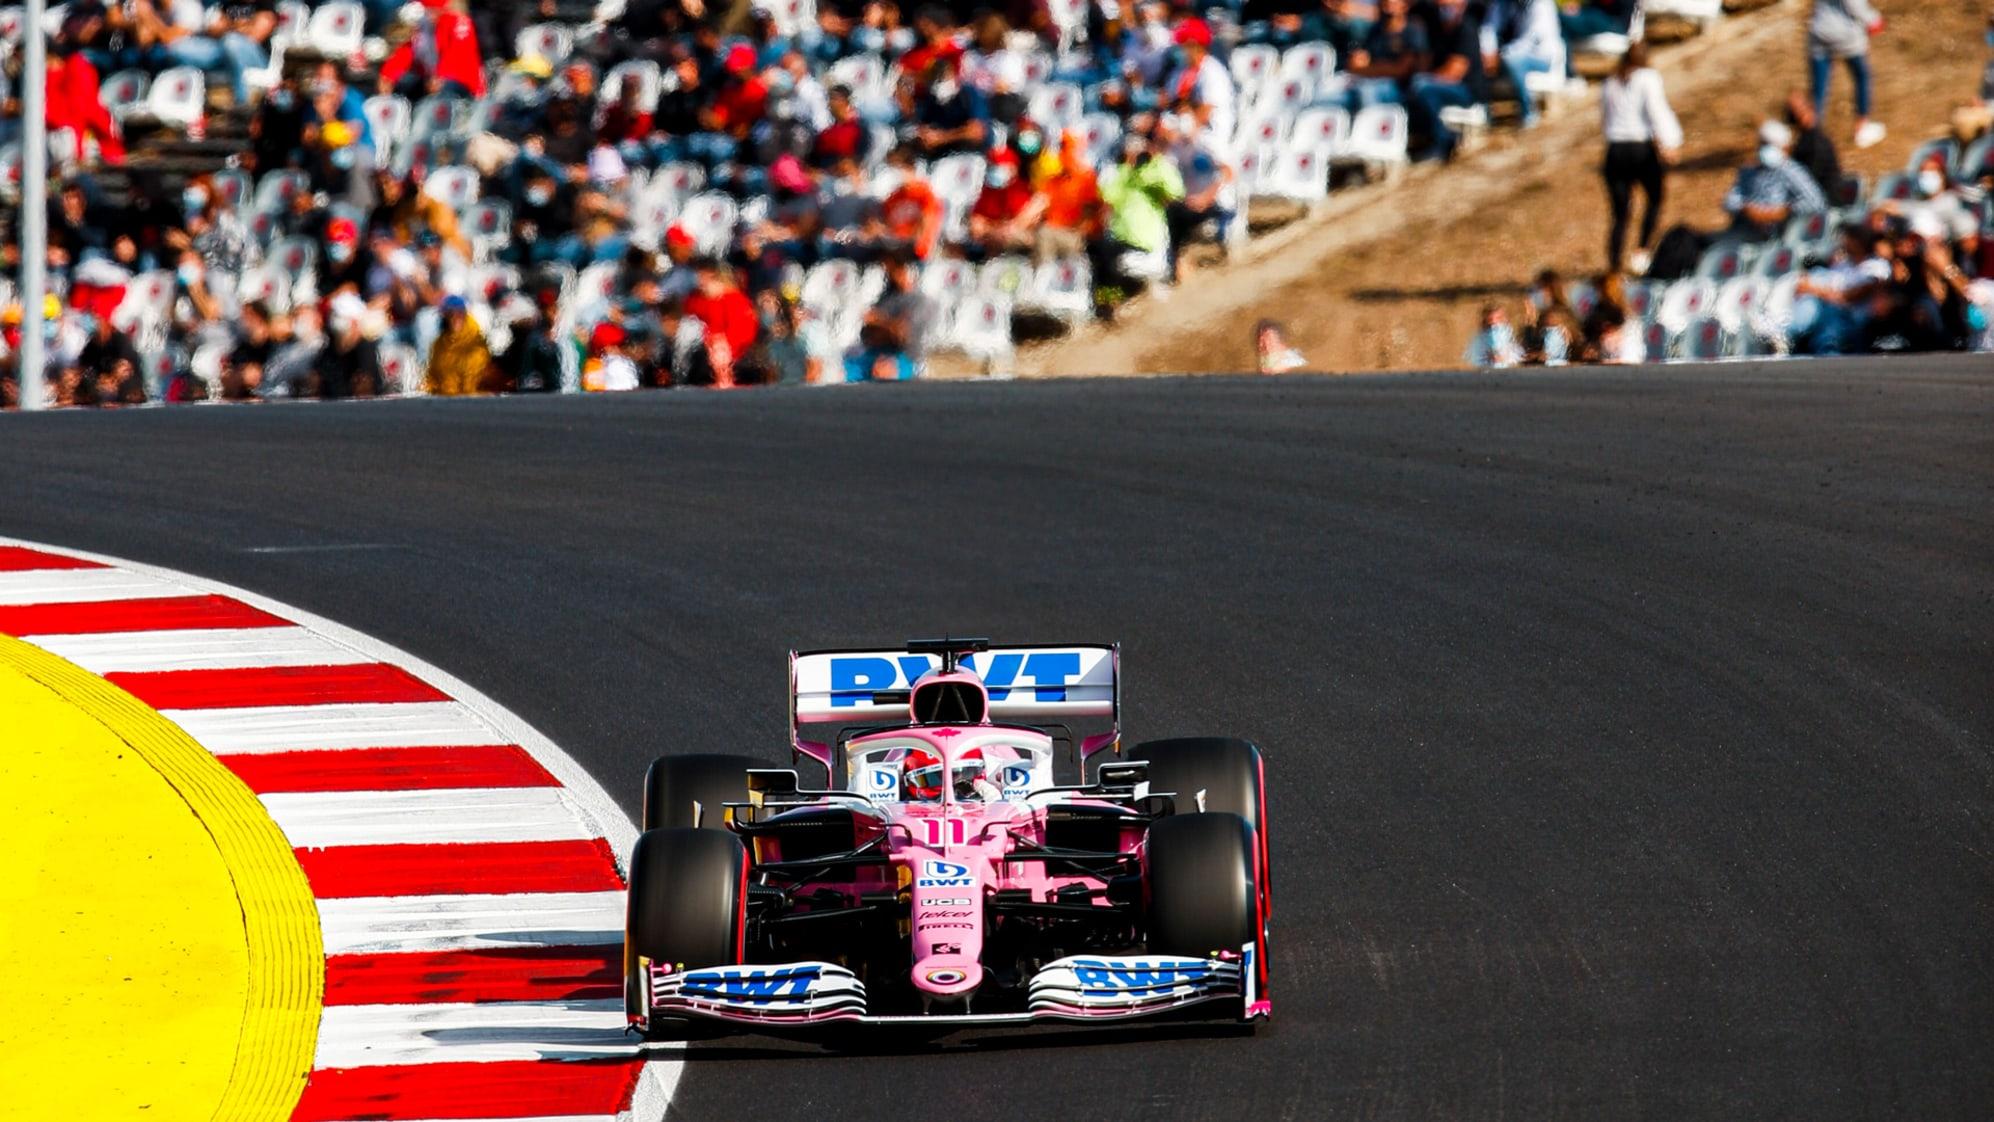 Sergio Perez podczas Grand Prix Portugalii 2020 na torze Algarve w Portimao